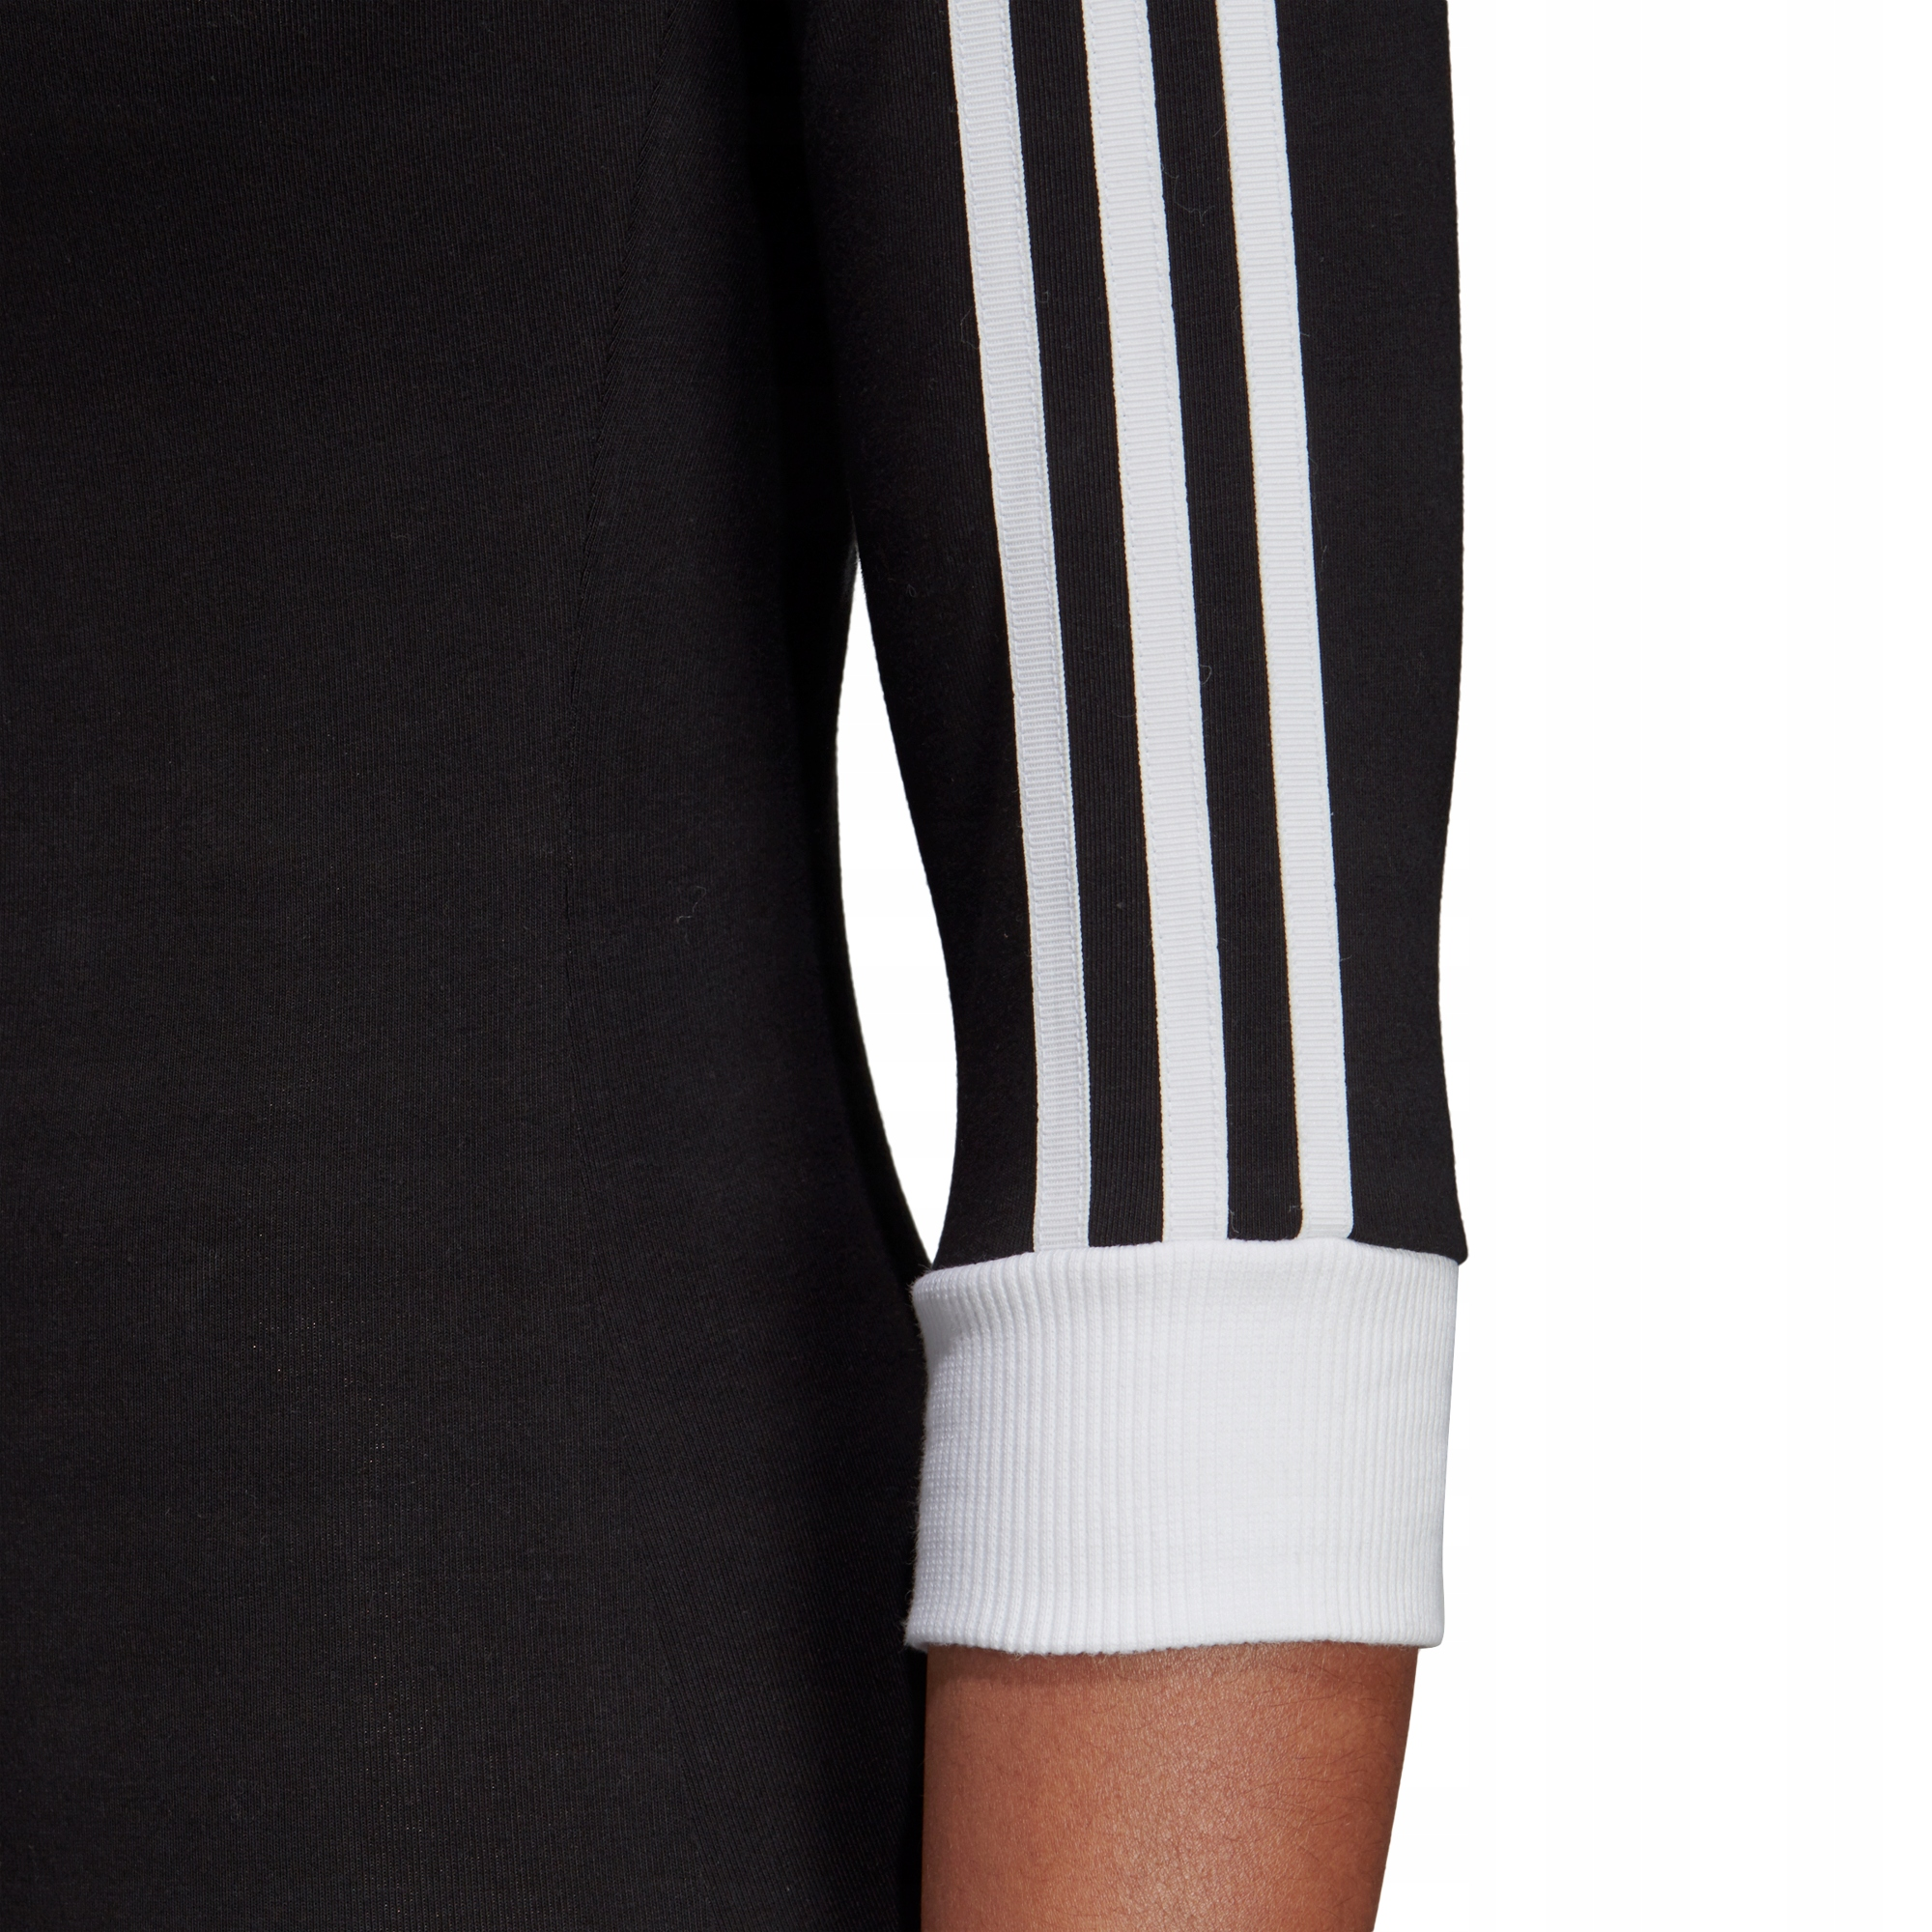 dc79d80b7d sukienka damska sportowa adidas r 38 DV2567 - 7697627848 - oficjalne ...